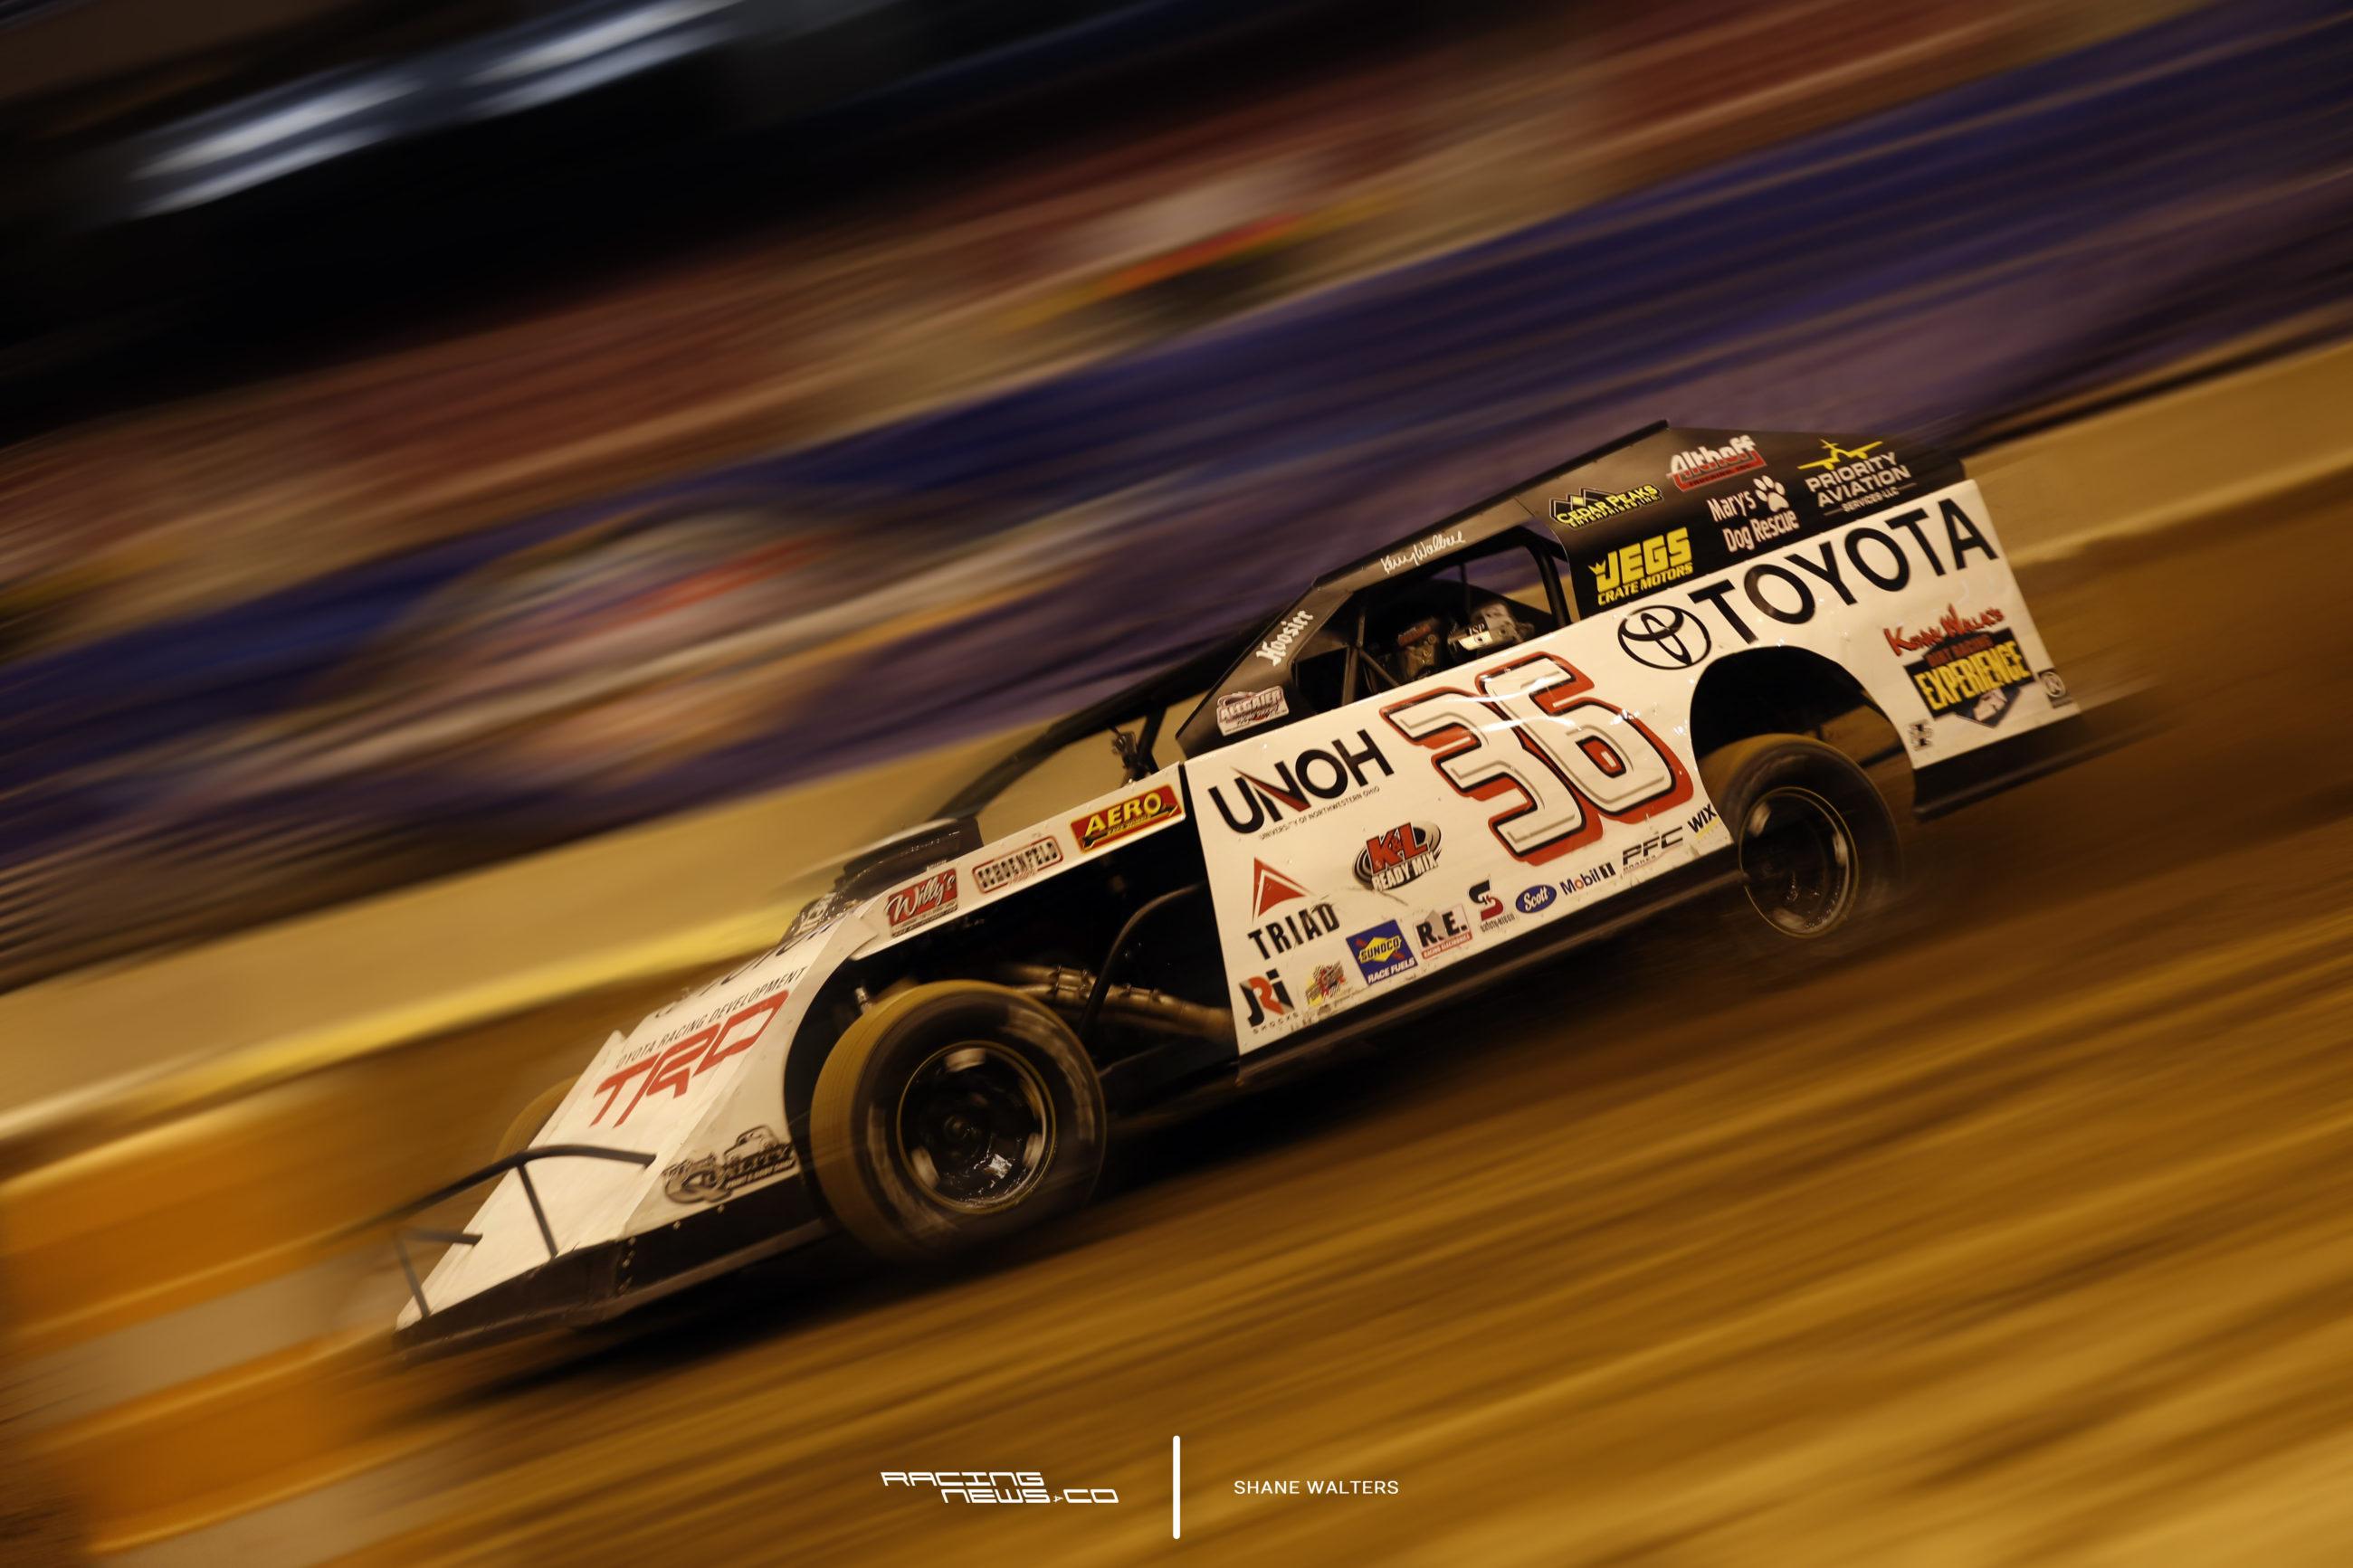 Kenny Wallace Motion Blur Dirt Modified - Gateway Dirt Photos 4992